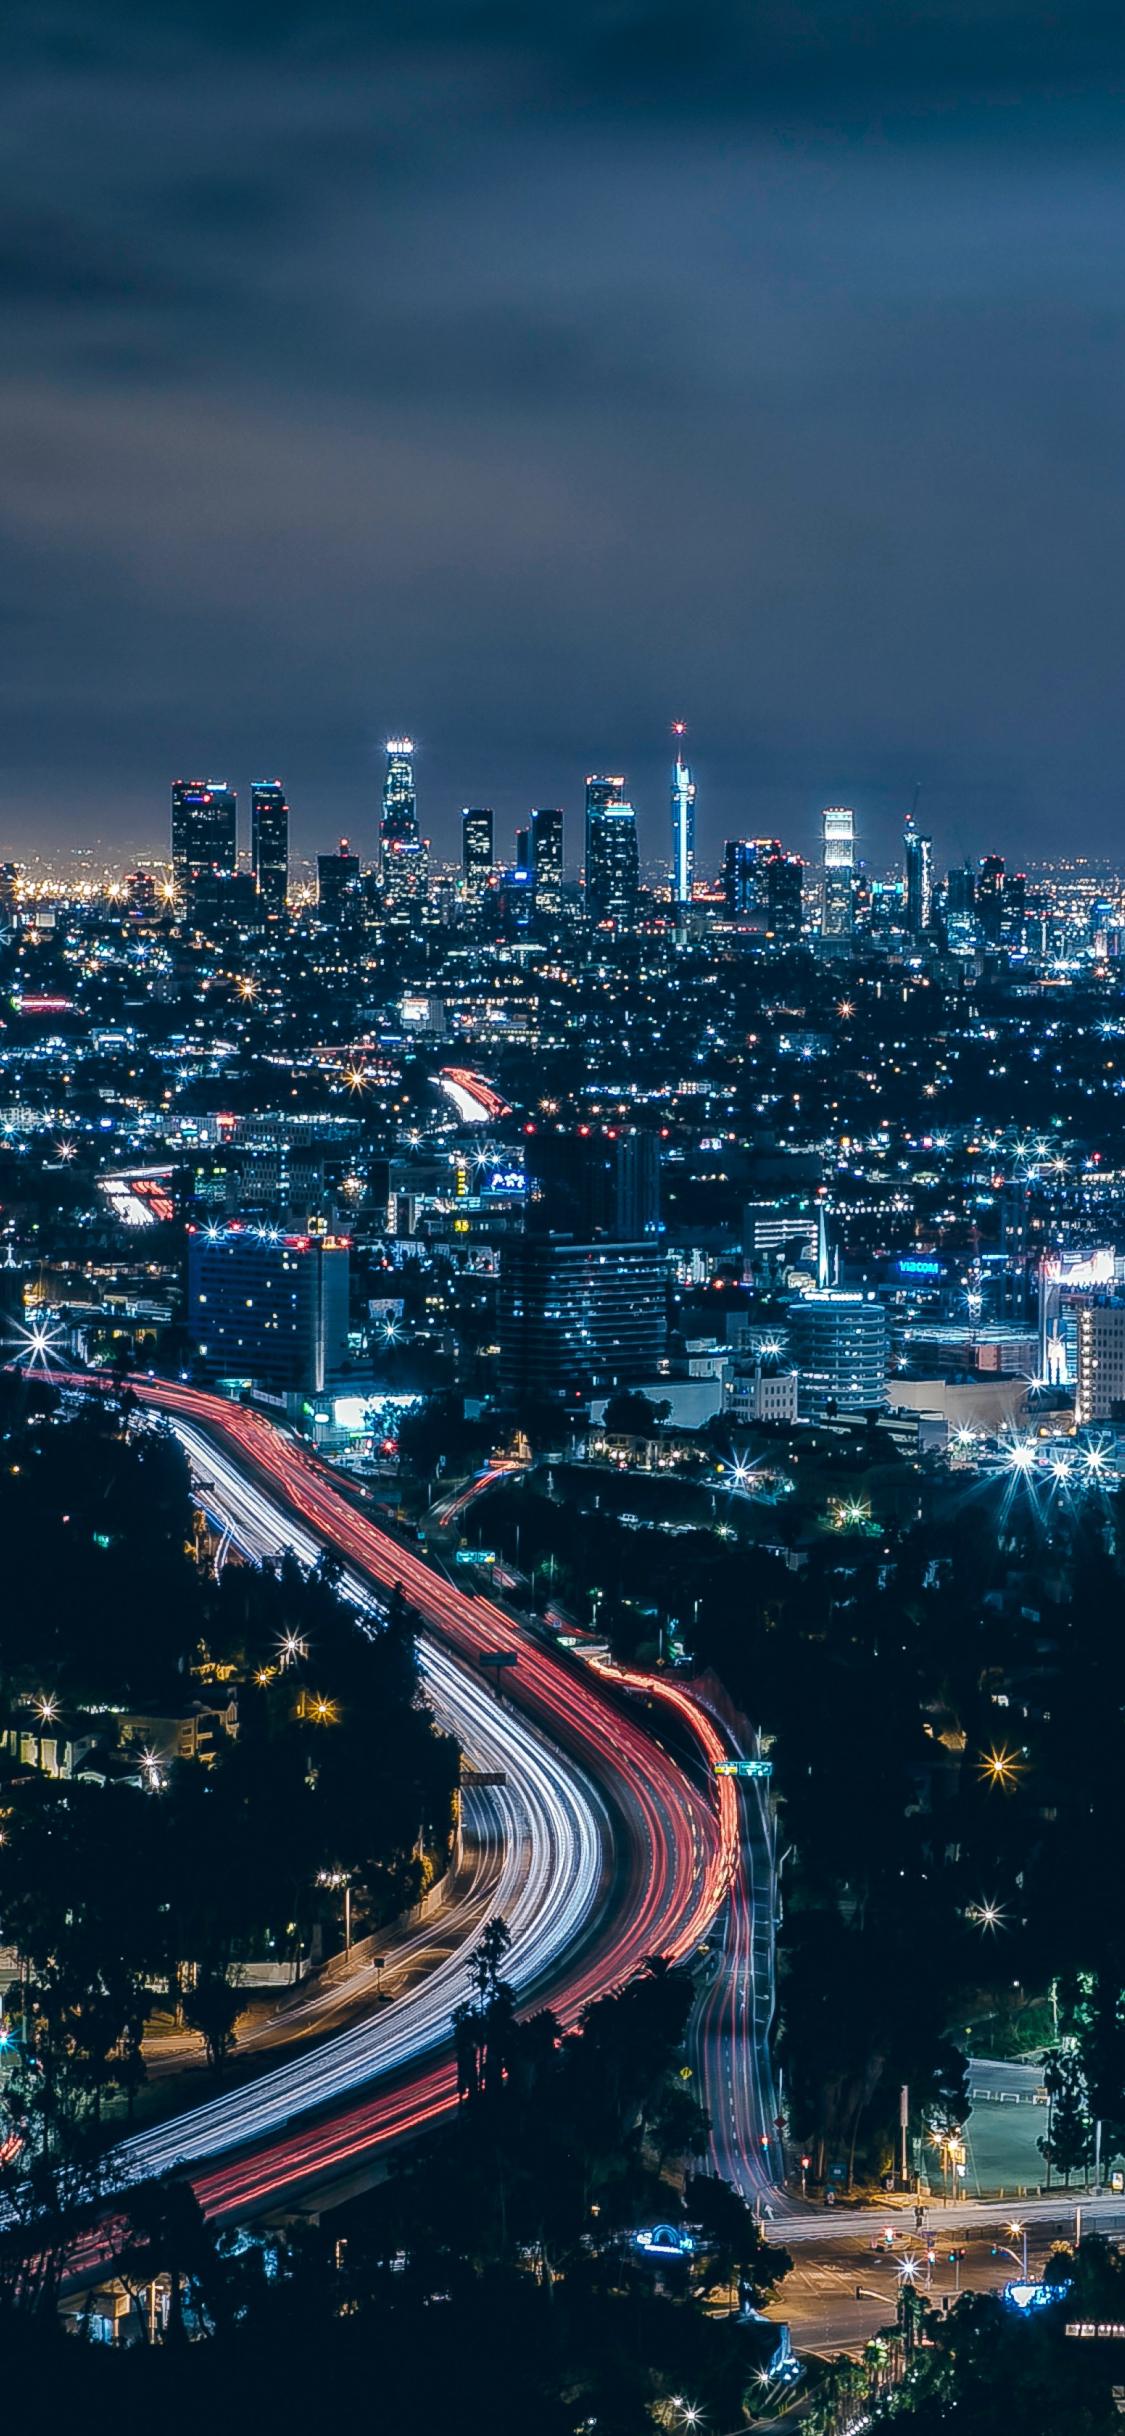 Download 1125x2436 Wallpaper Los Angeles City Skyscrapers